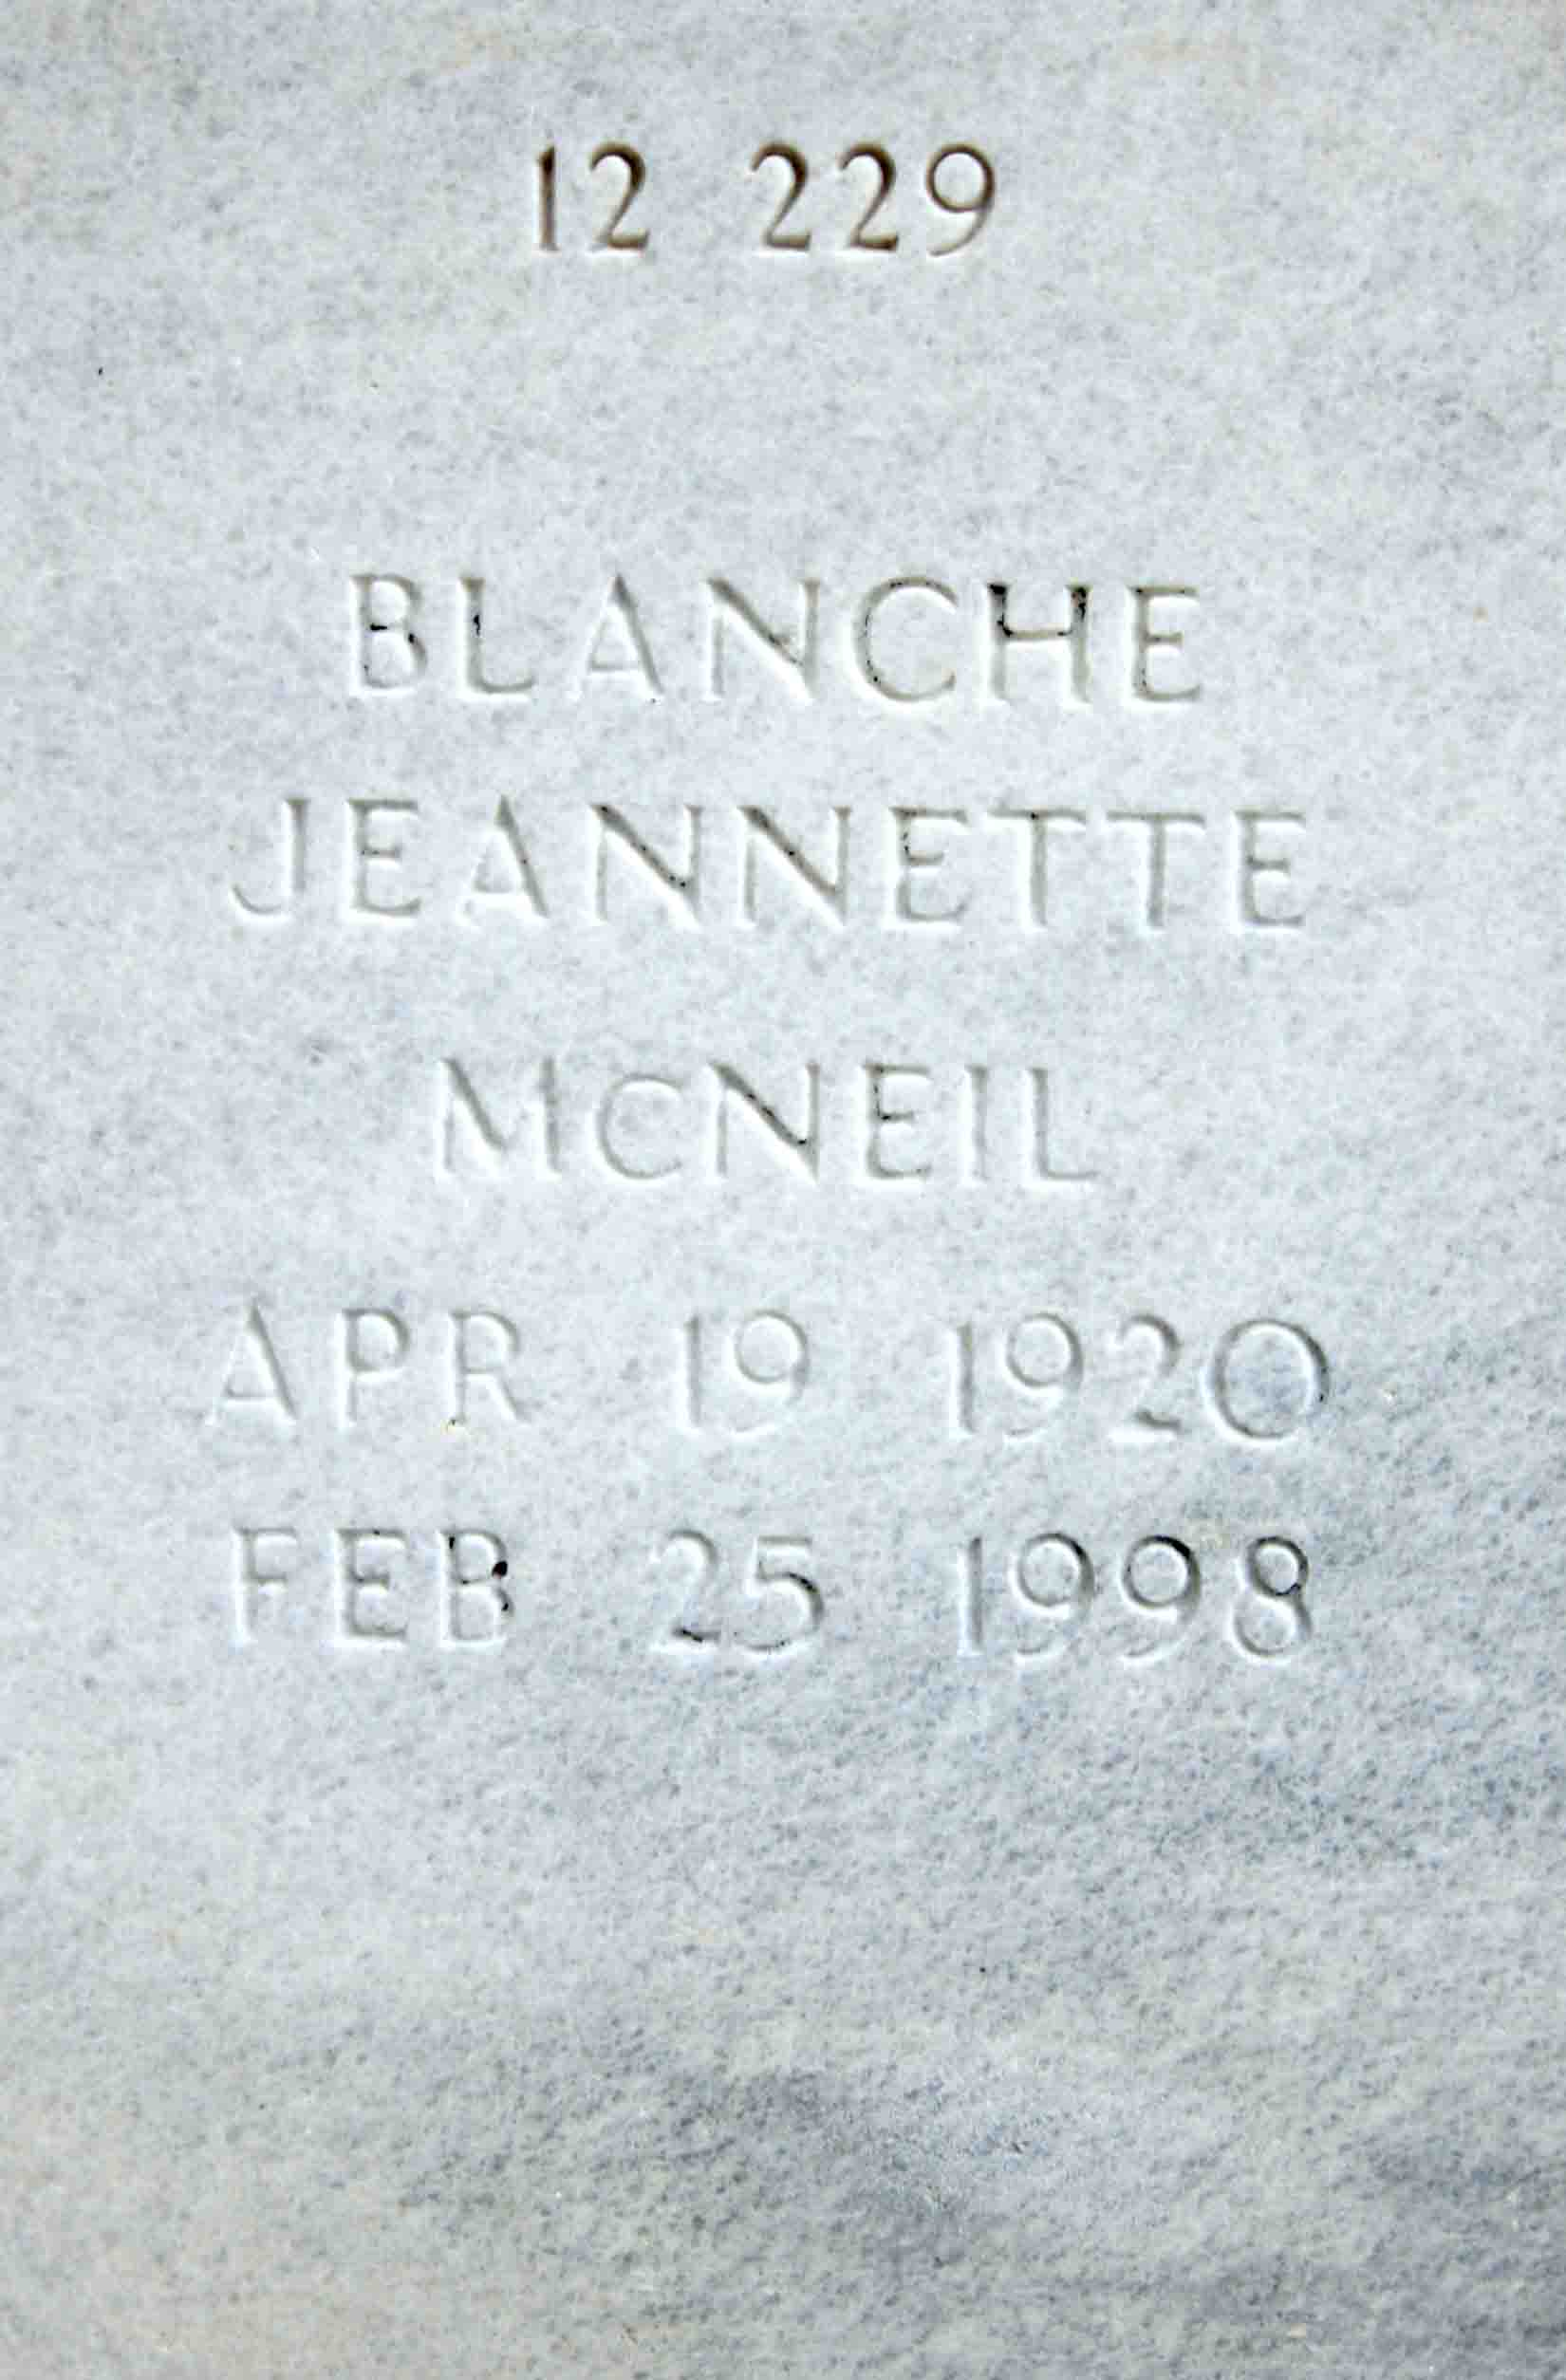 Blanche Jeanette Mcneil